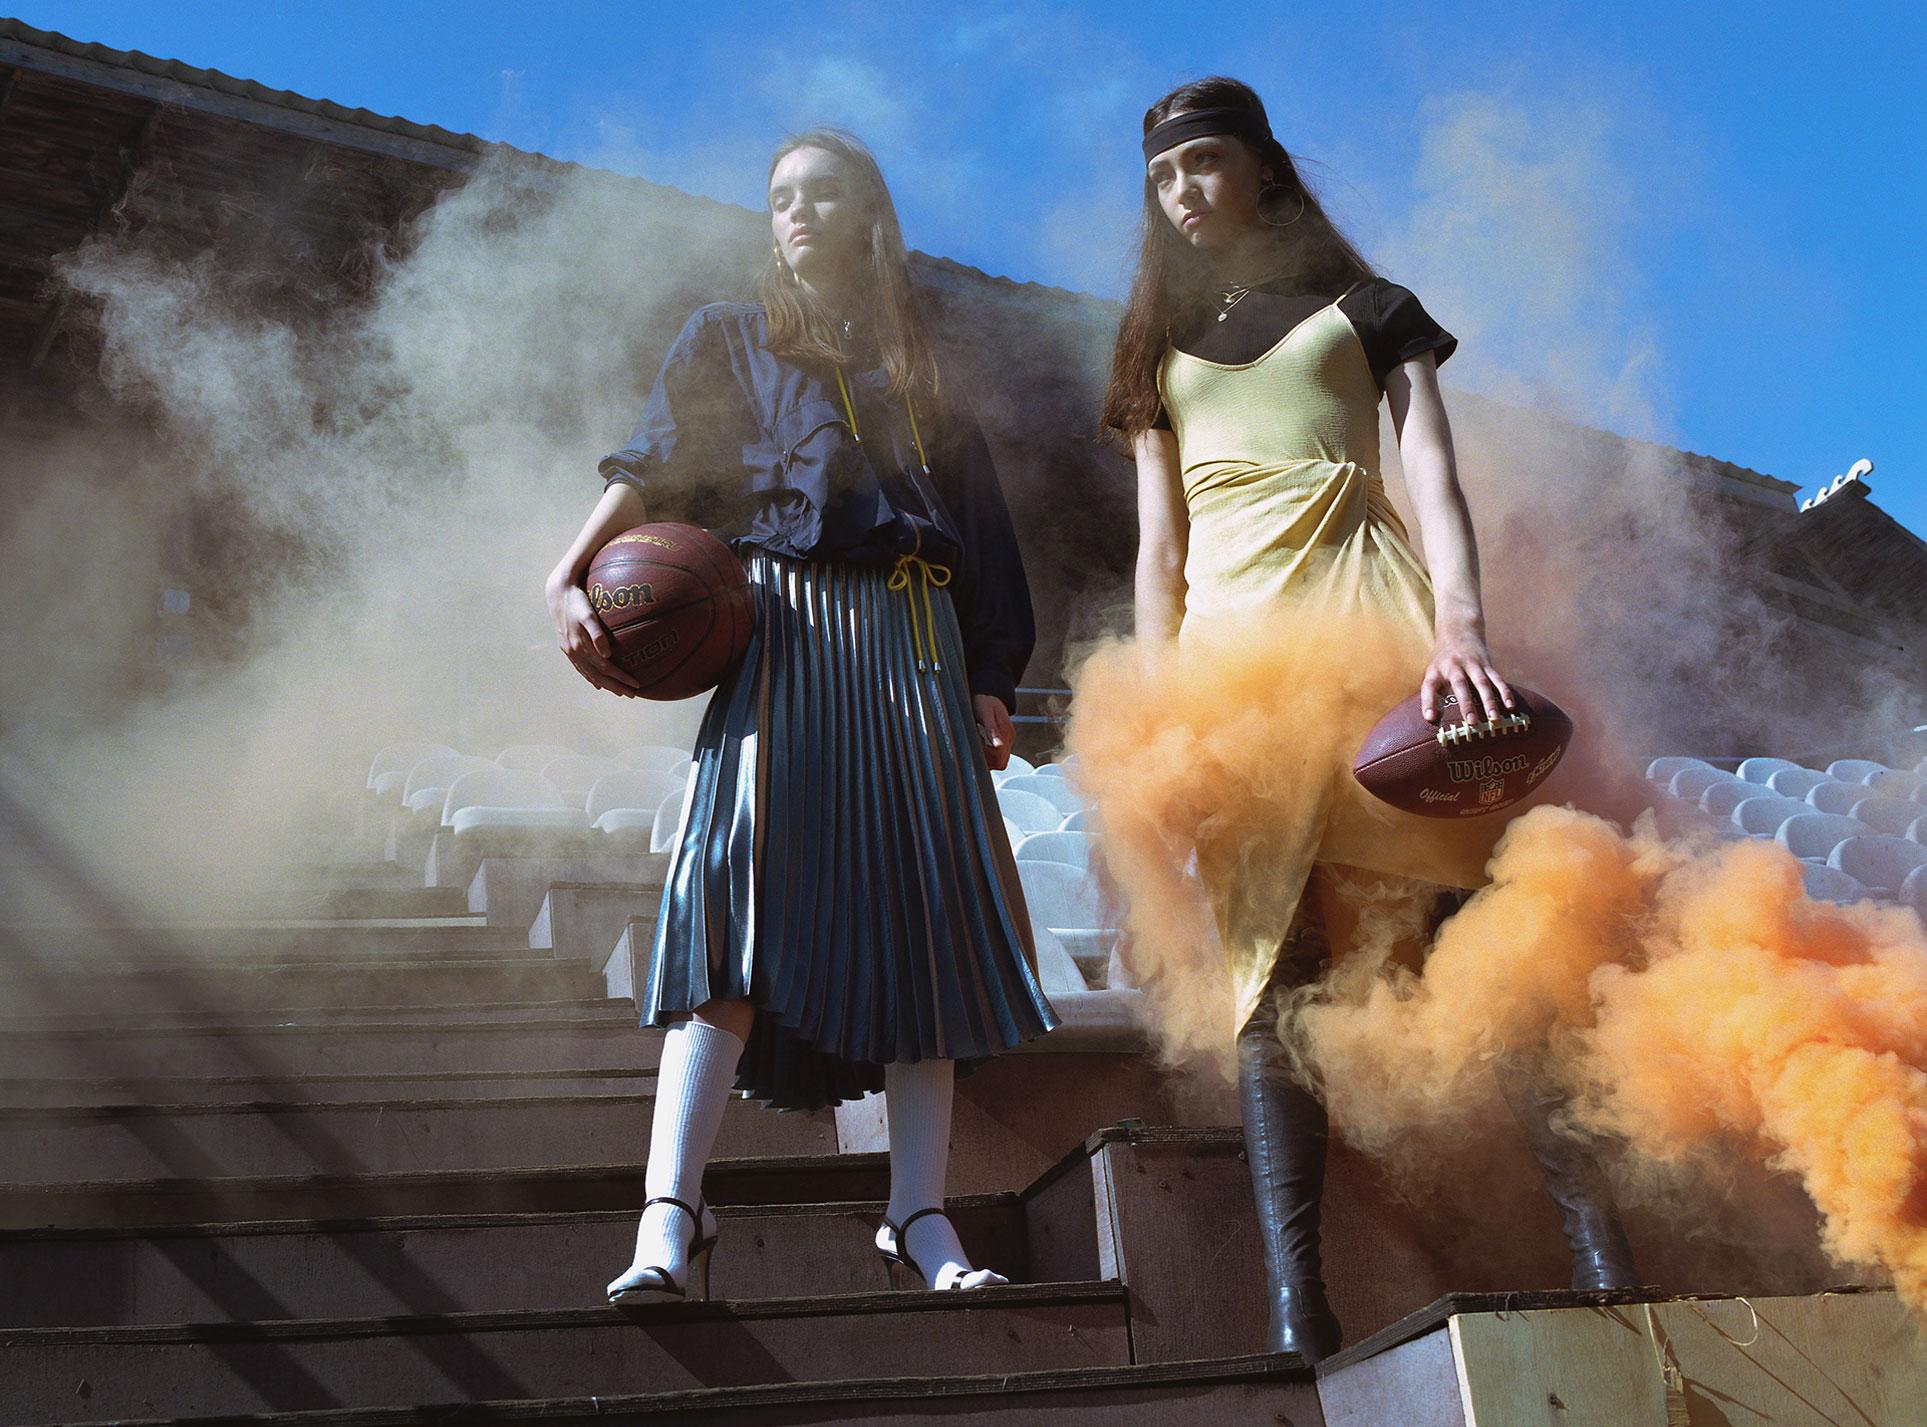 Красивые девушки и баскетбол, бейсбол и американский футбол / фото 01